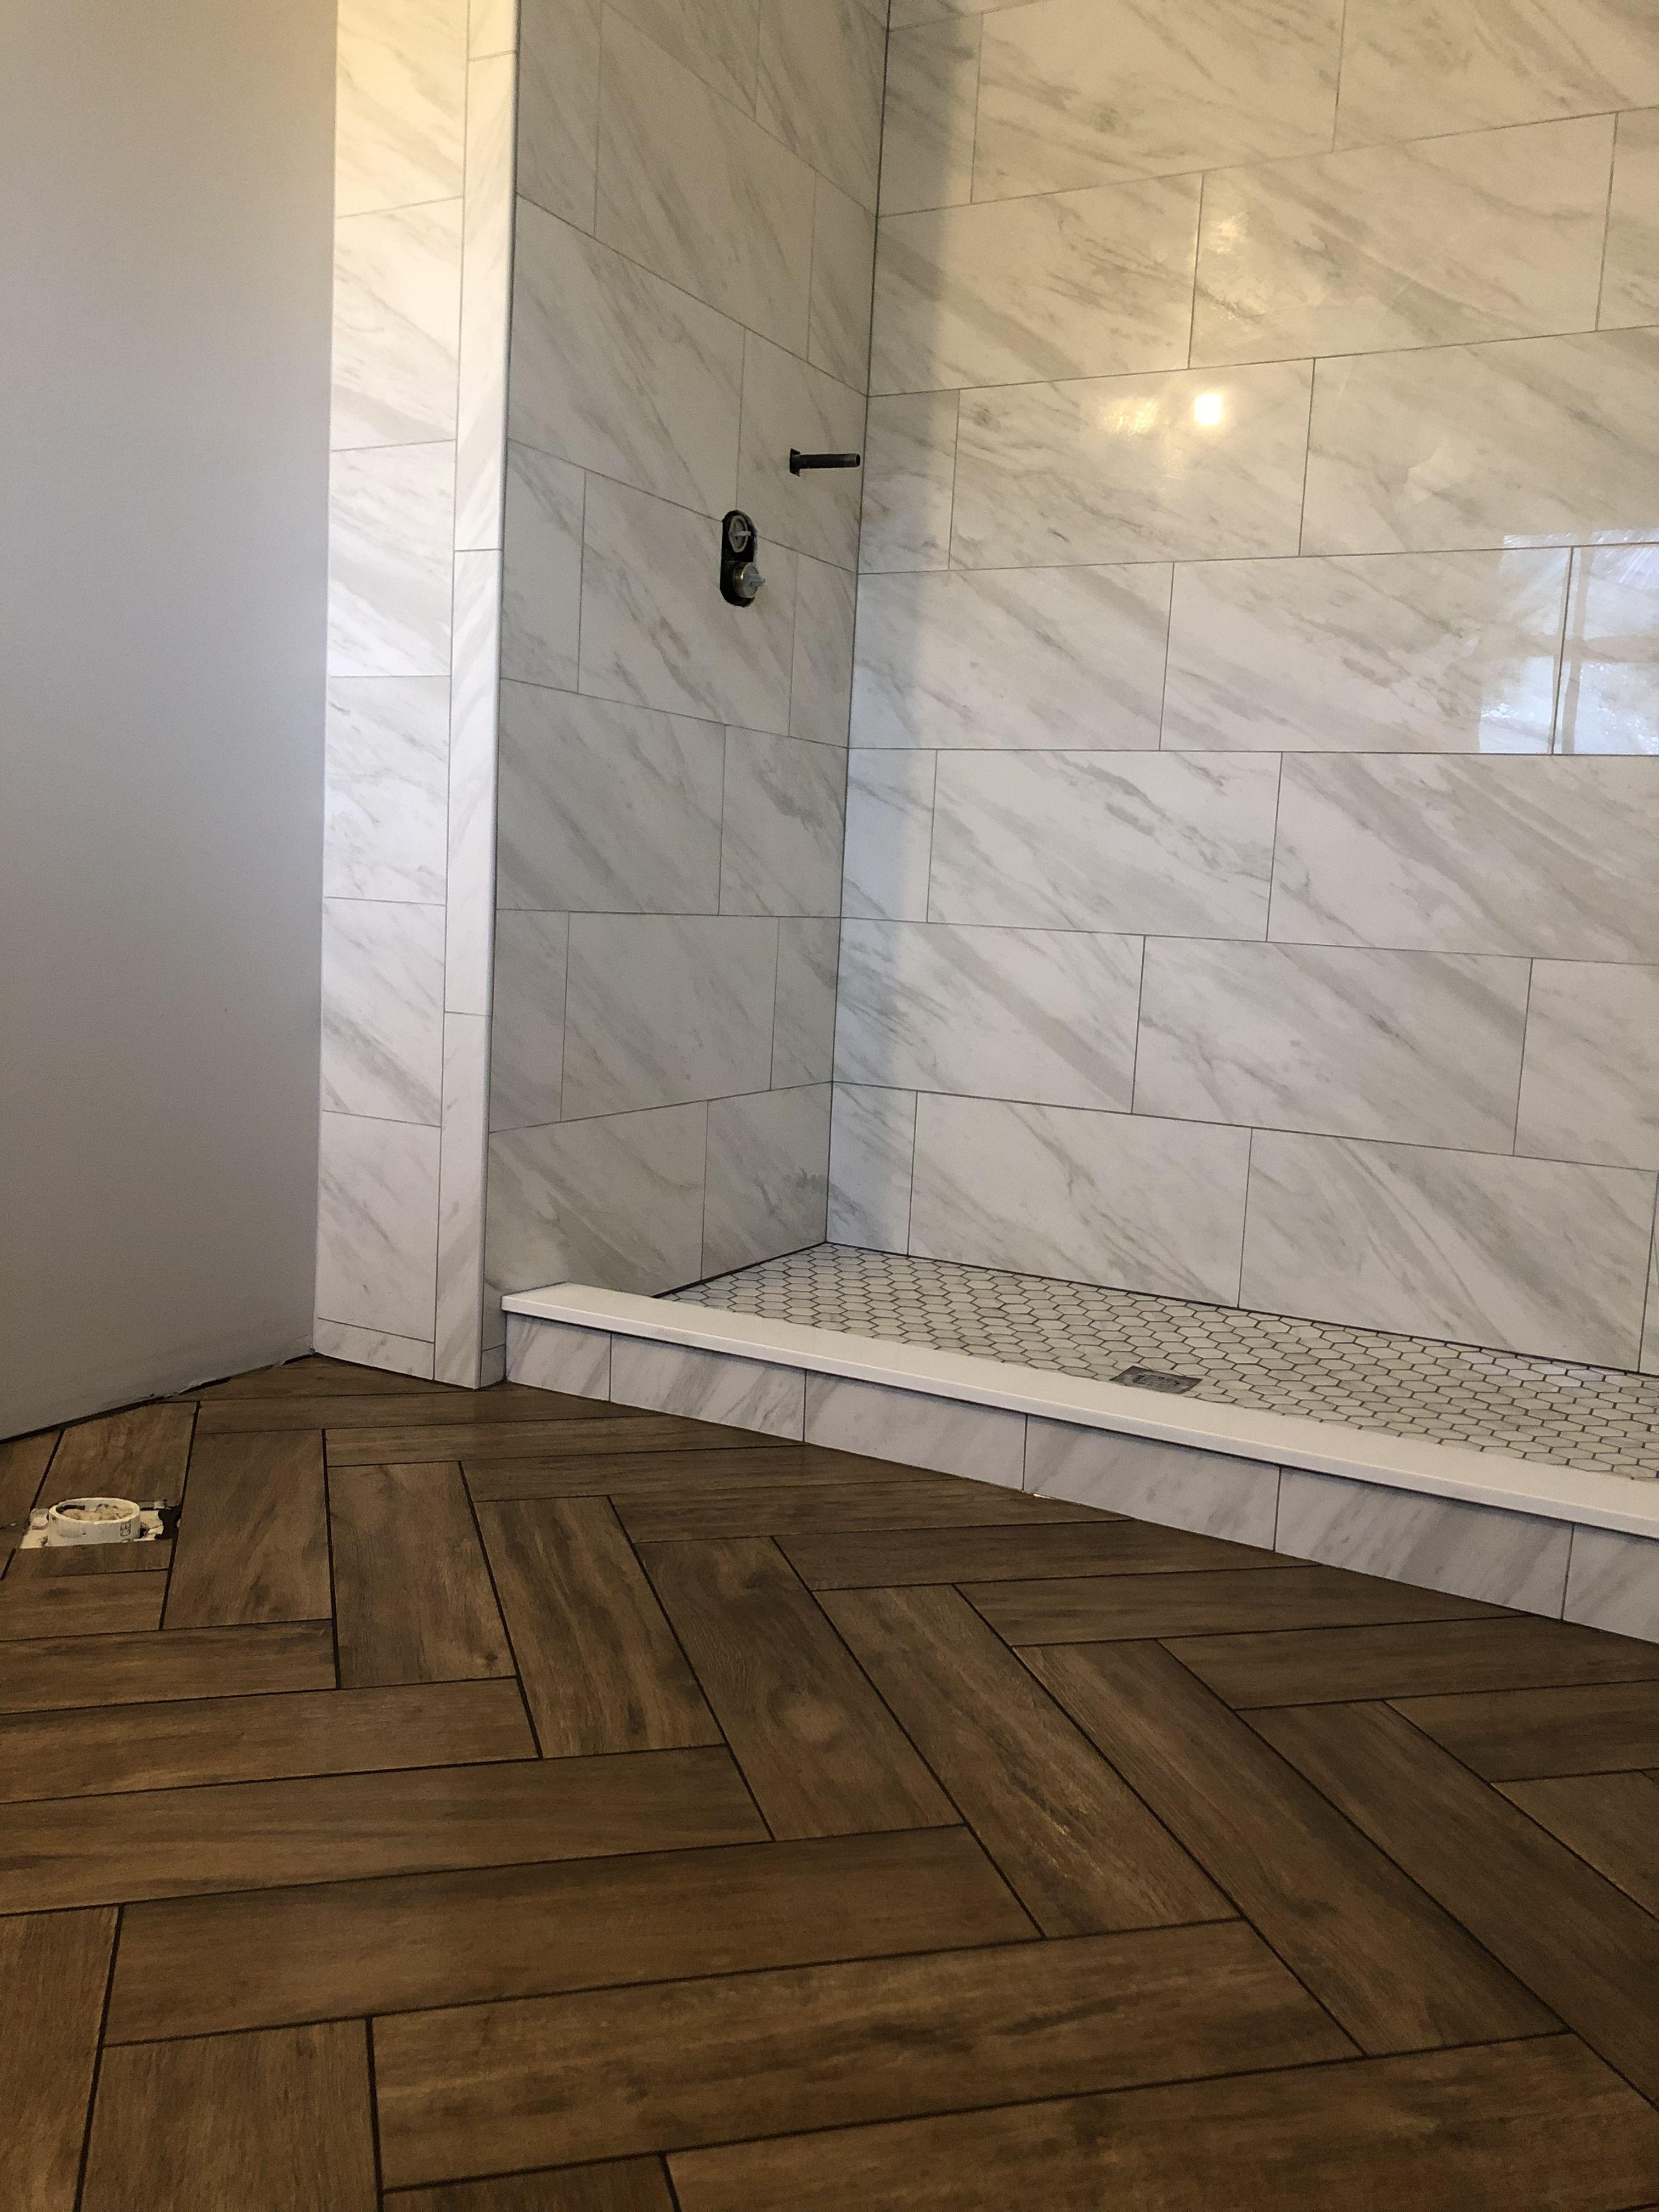 Pin by ruslan khalikov on new shower Wood floor bathroom